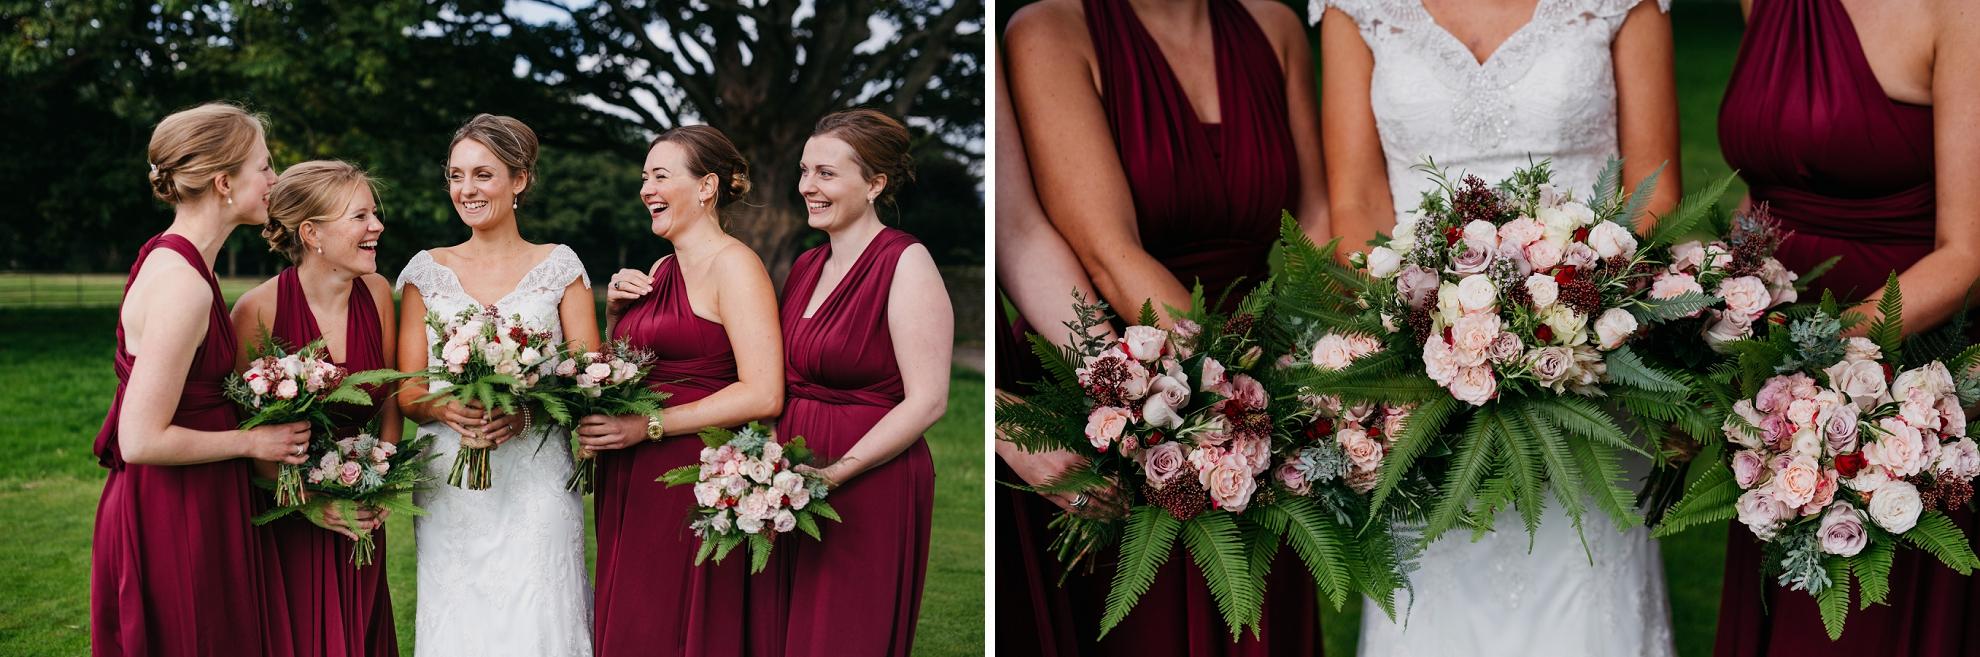 broughton-hall-wedding-photographer_034